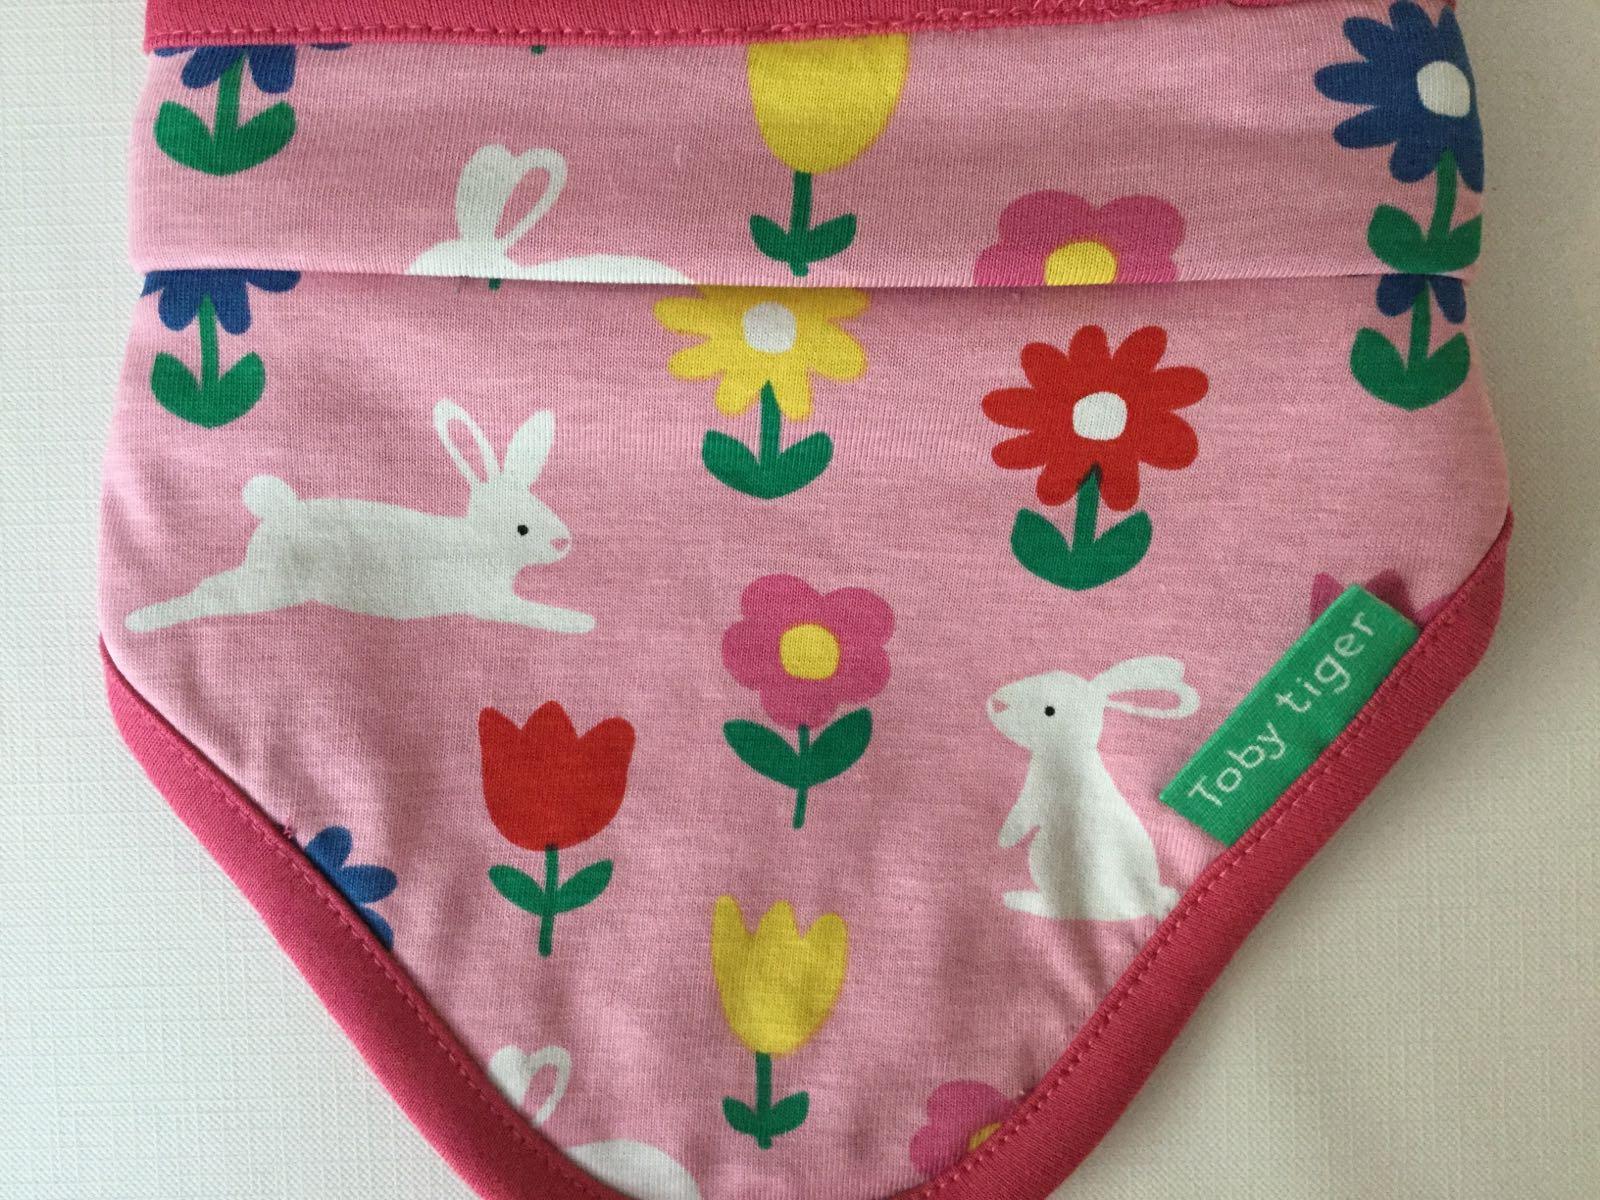 Toby tiger - dribble bib -  Pink bunny